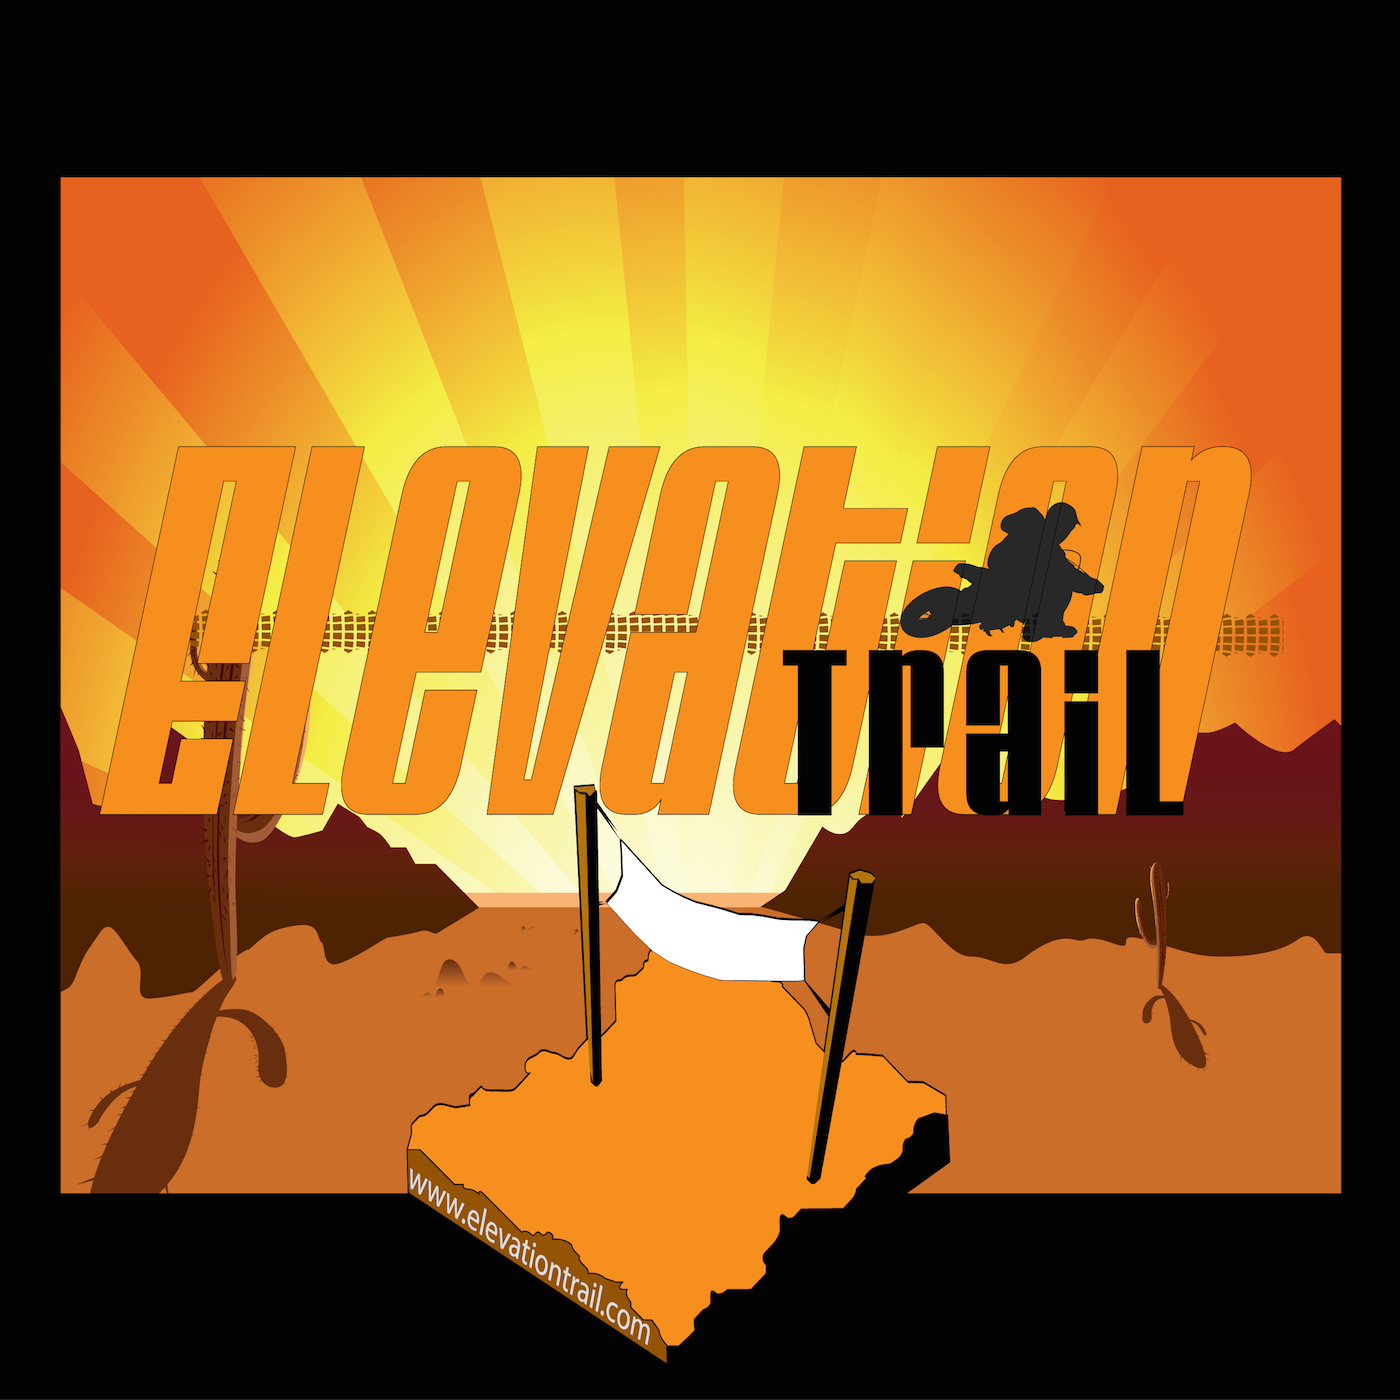 Elevation Trail